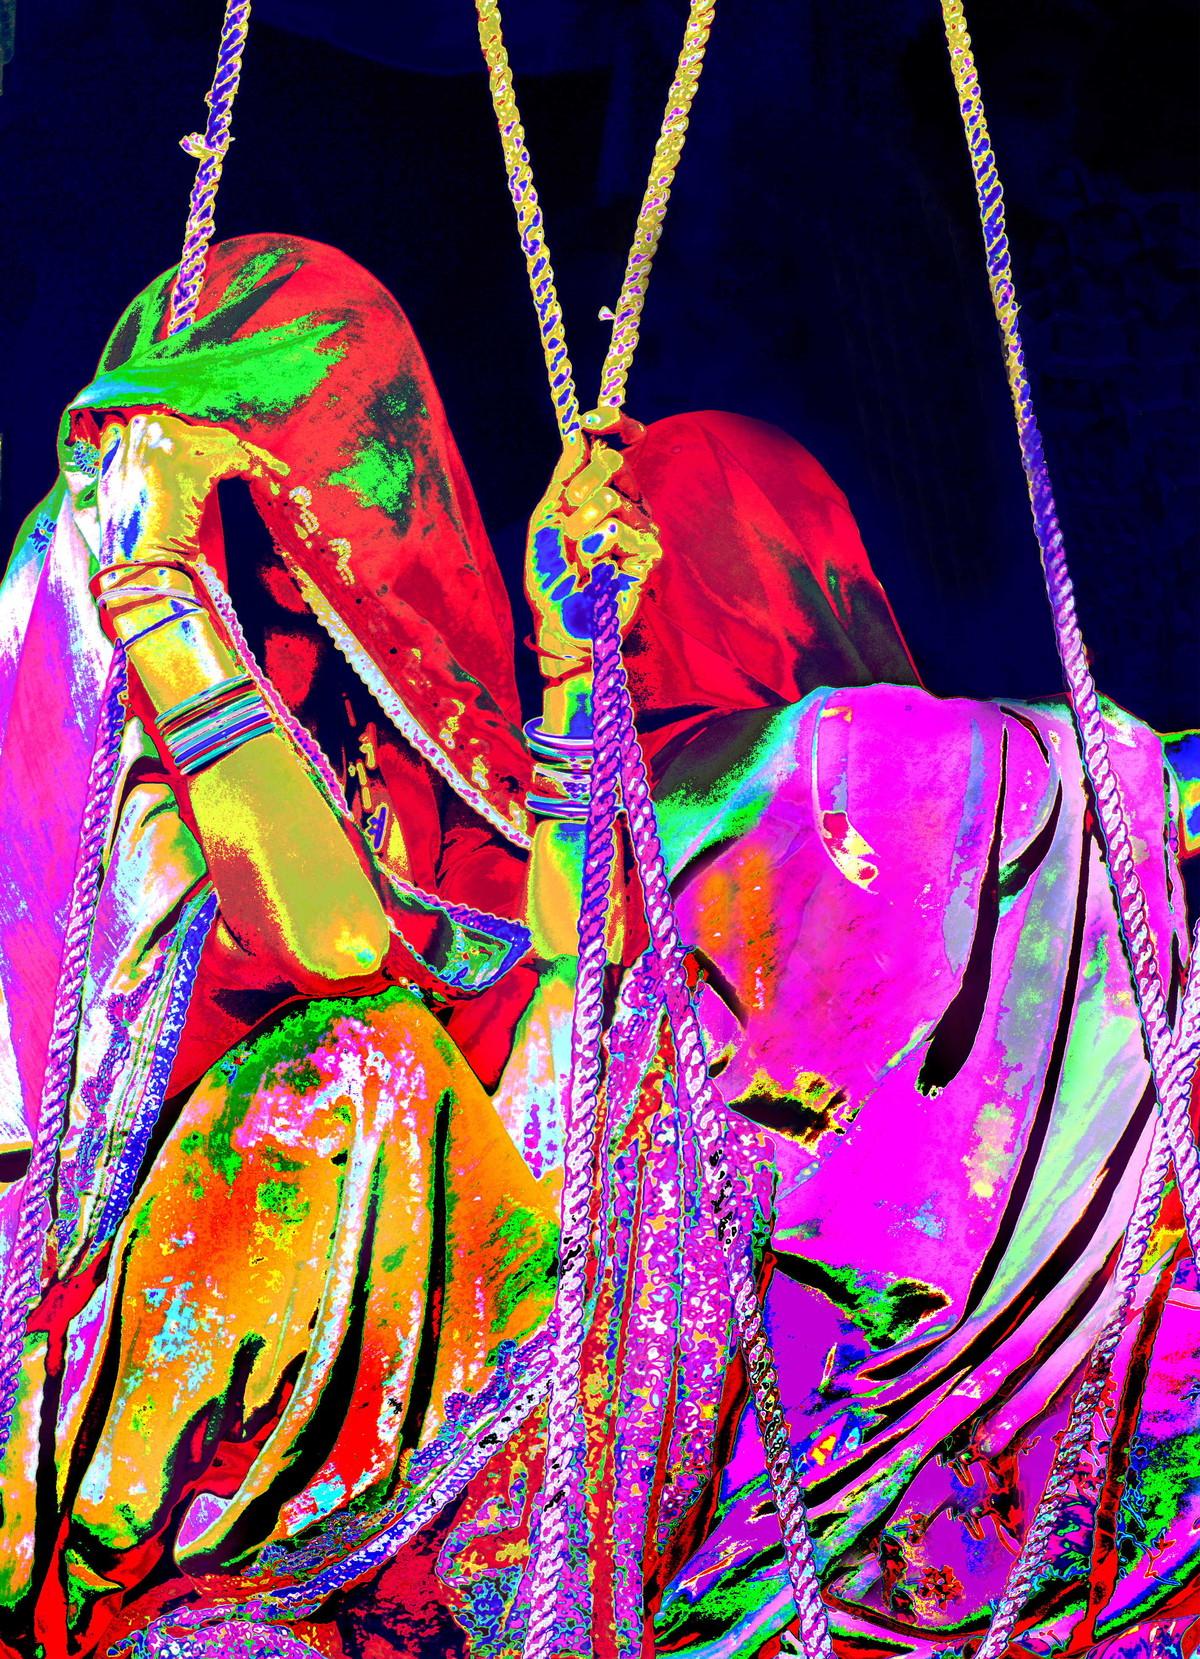 Women to market pusker by Karan Khanna, Image Photography, Oil on Canvas, Purple color